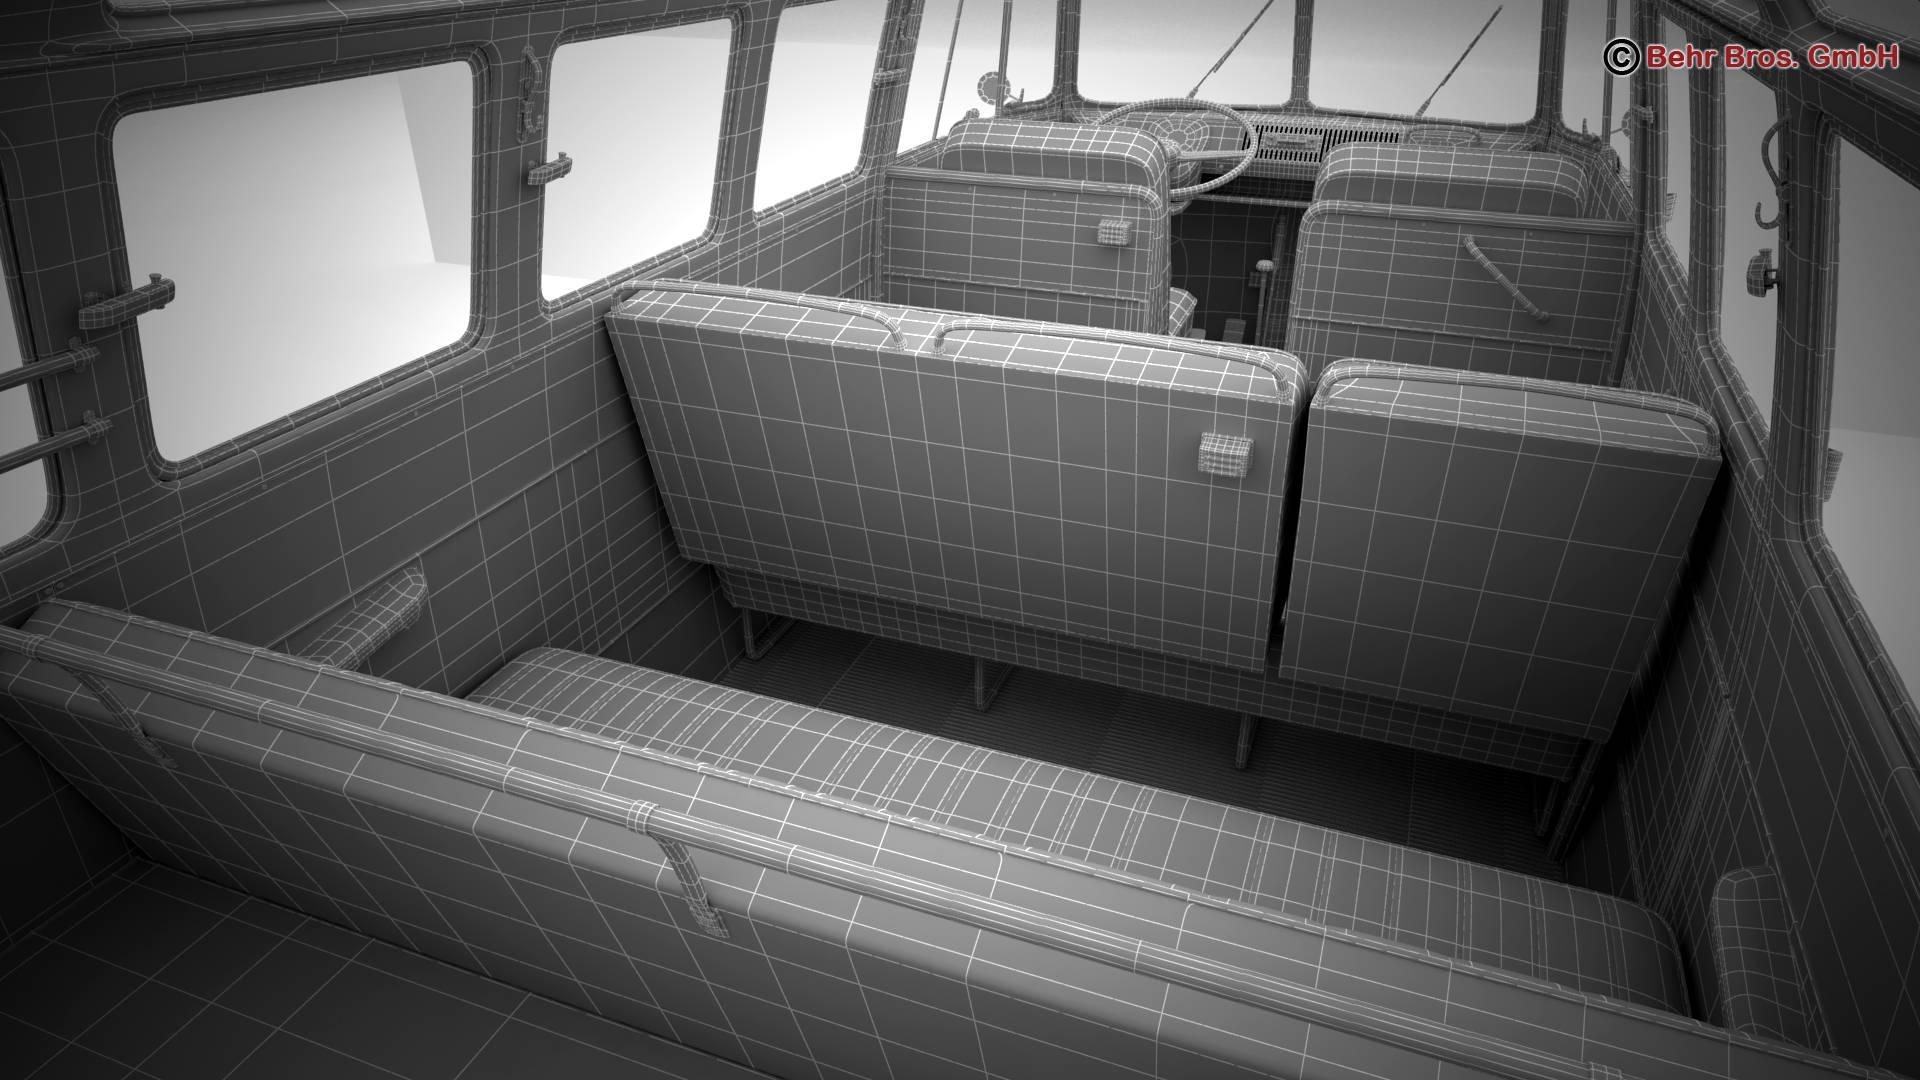 volkswagen type 2 samba 1963 hippie 3d model 3ds max fbx c4d lwo ma mb obj 217272